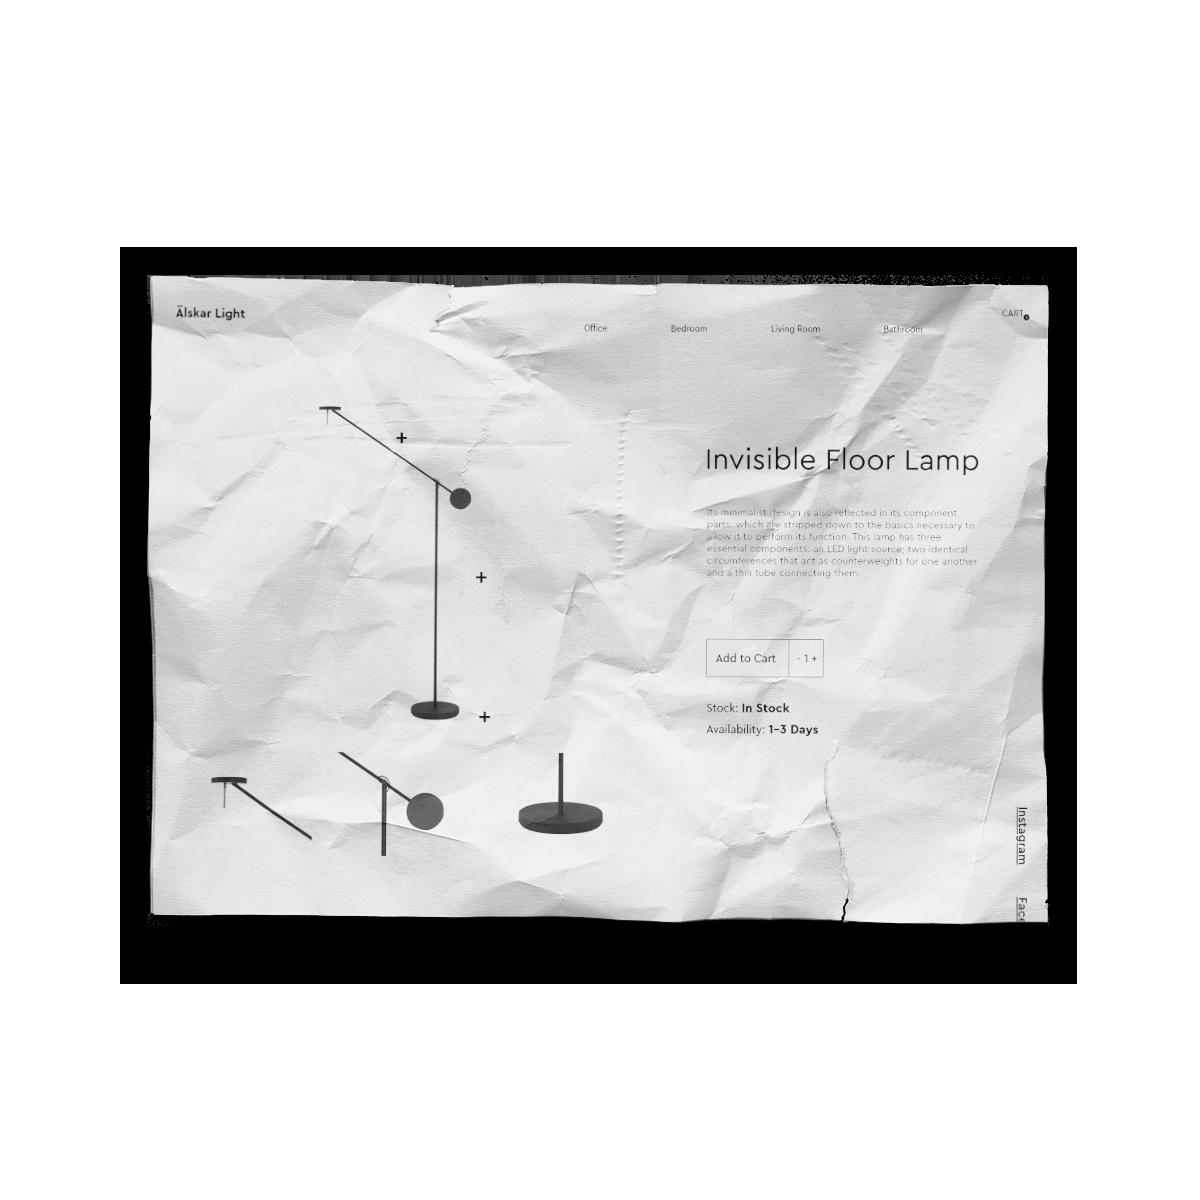 Coffee website UI Design • Elena Theodoridou - Kofteridou Despina